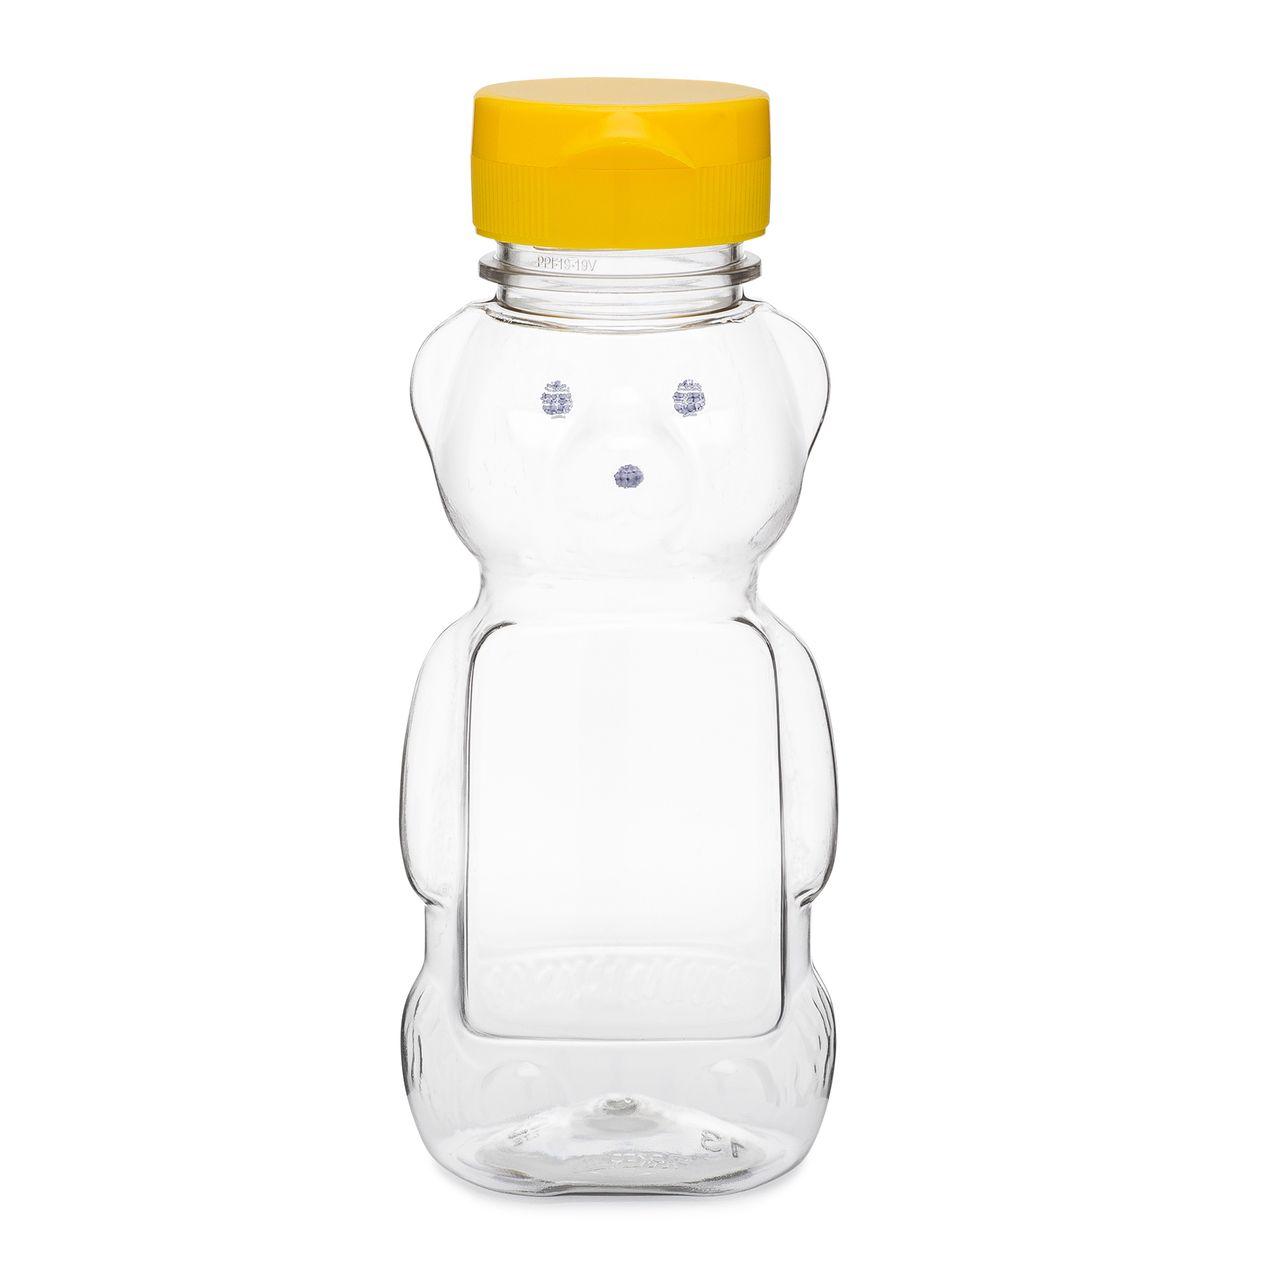 Flip Top Cap Mould Design Cx F2035 Specification 20 410 28 410 Color Any Color Is Ok Material Pp Collar Mould Design Bottle Design Packaging Plastic Design